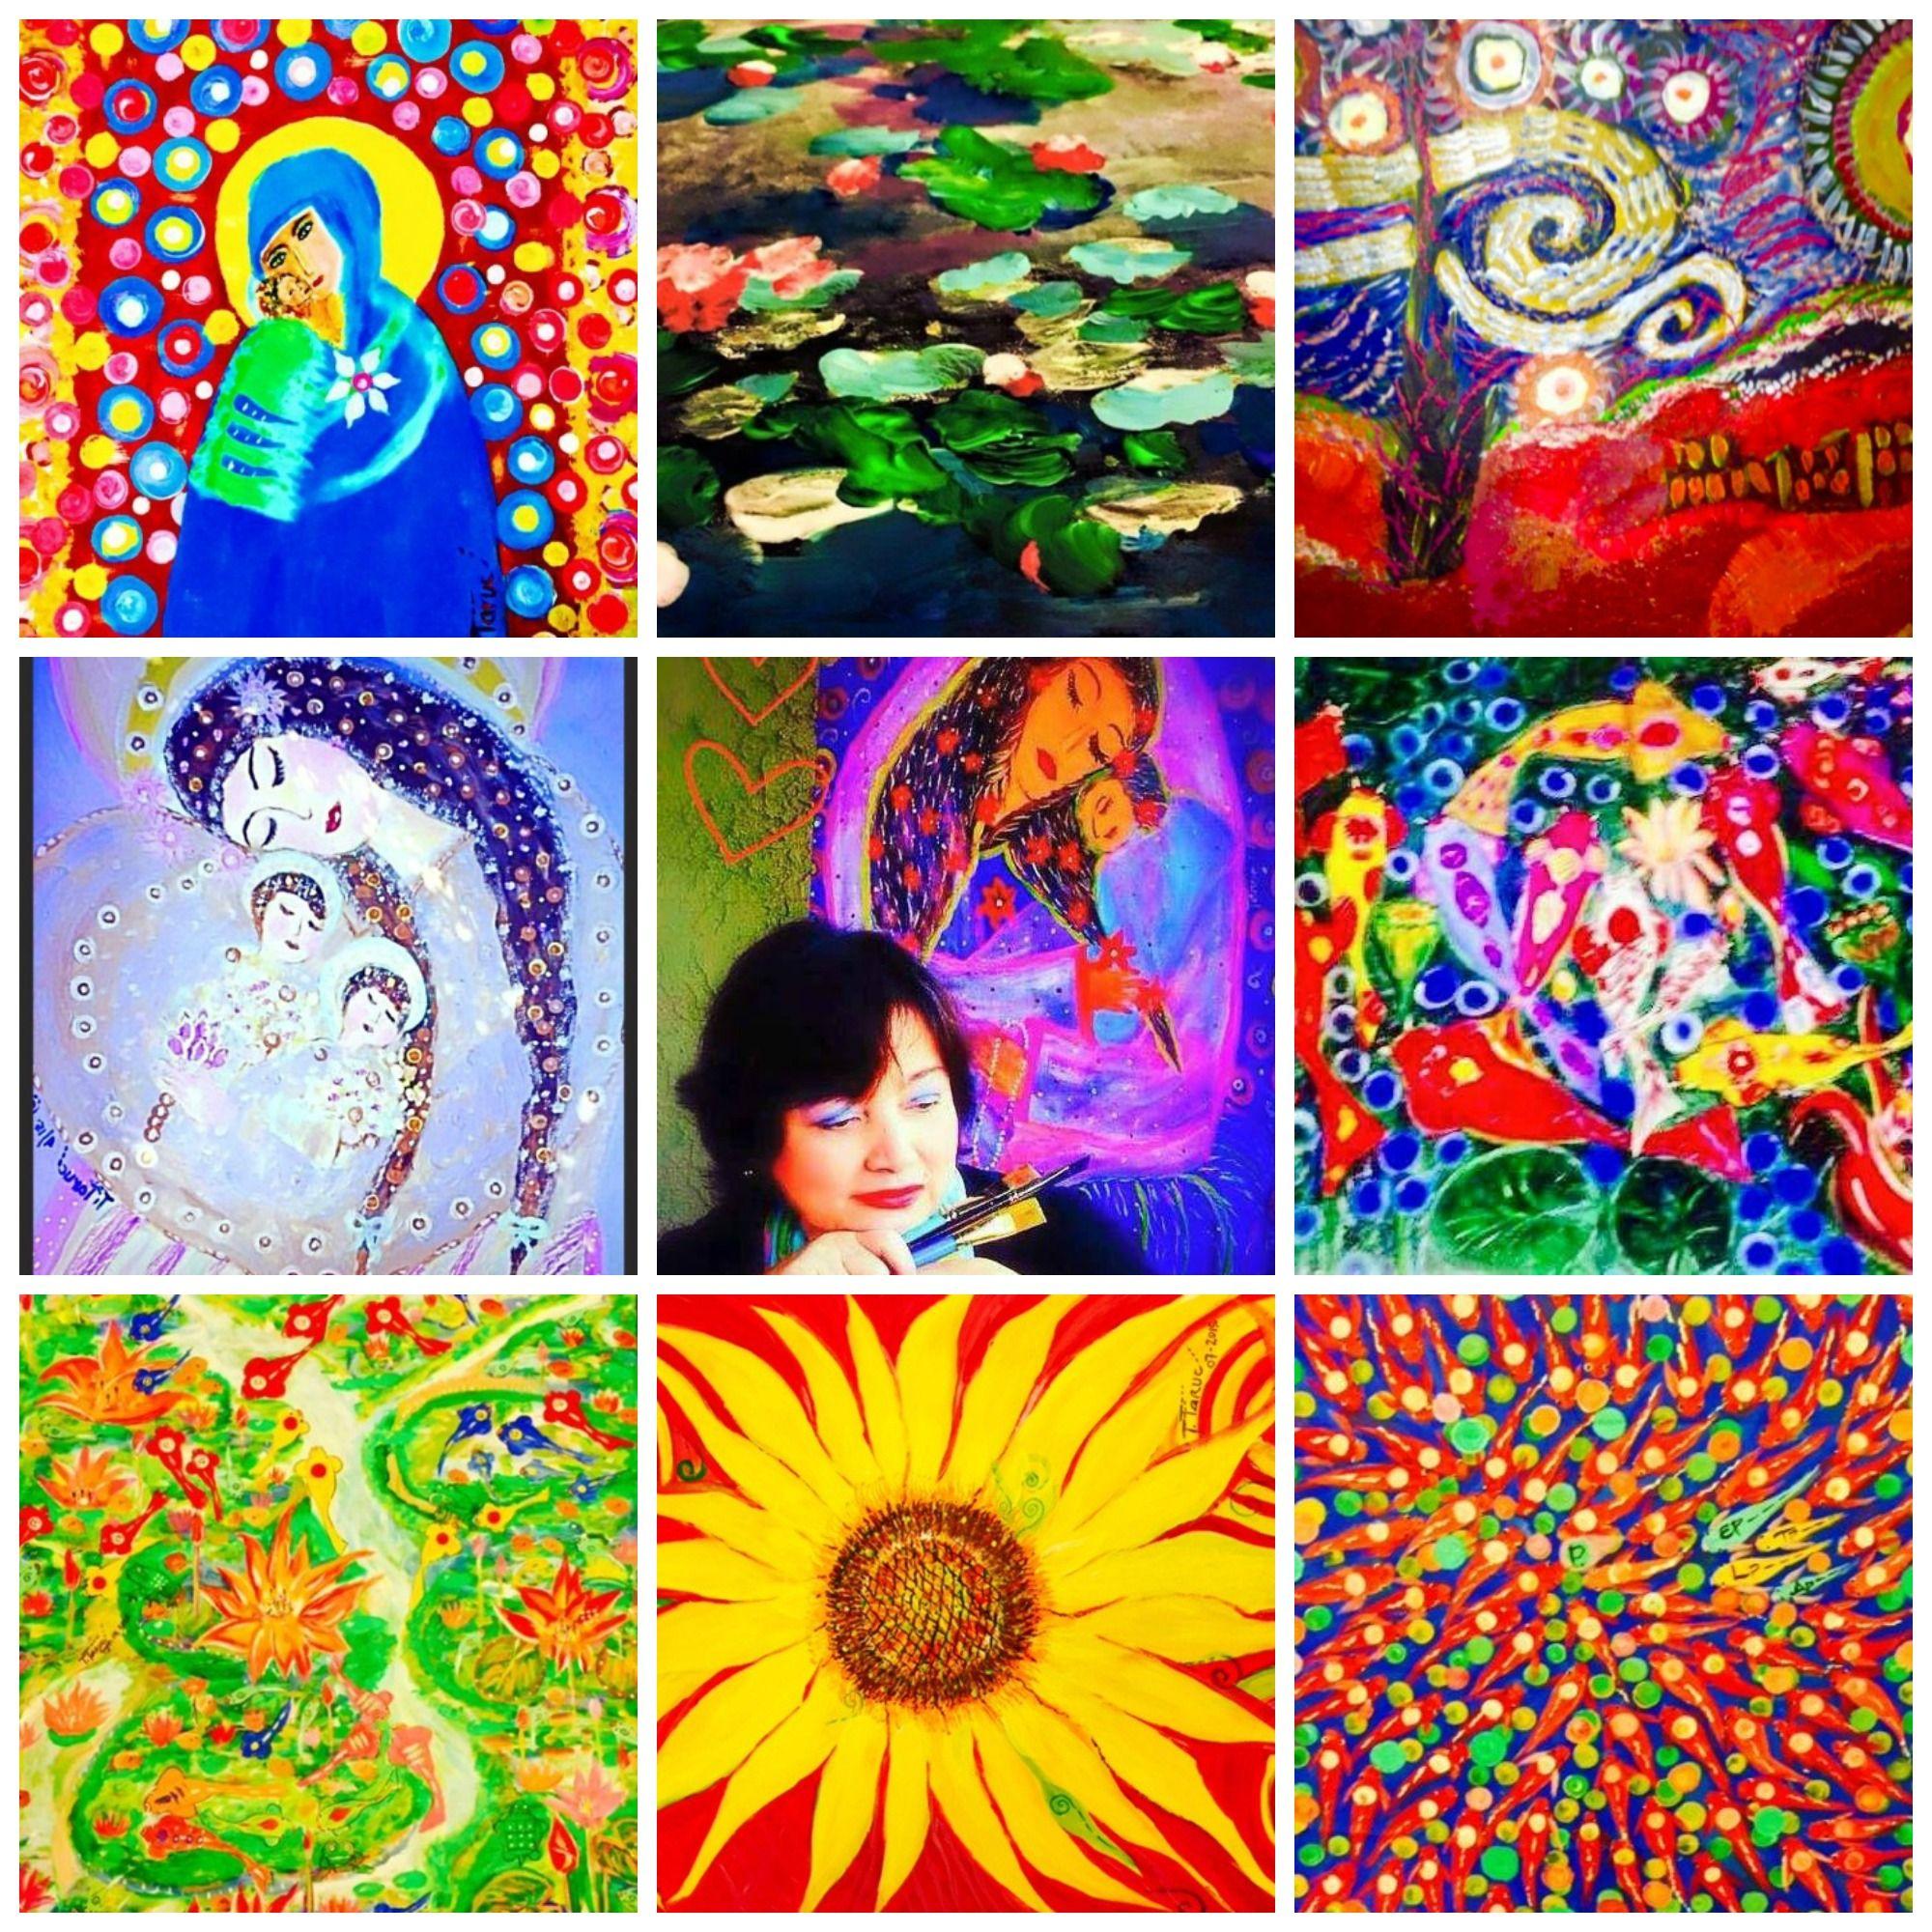 """Tiinz"" Taruc Impressionistic Art Philippine art"